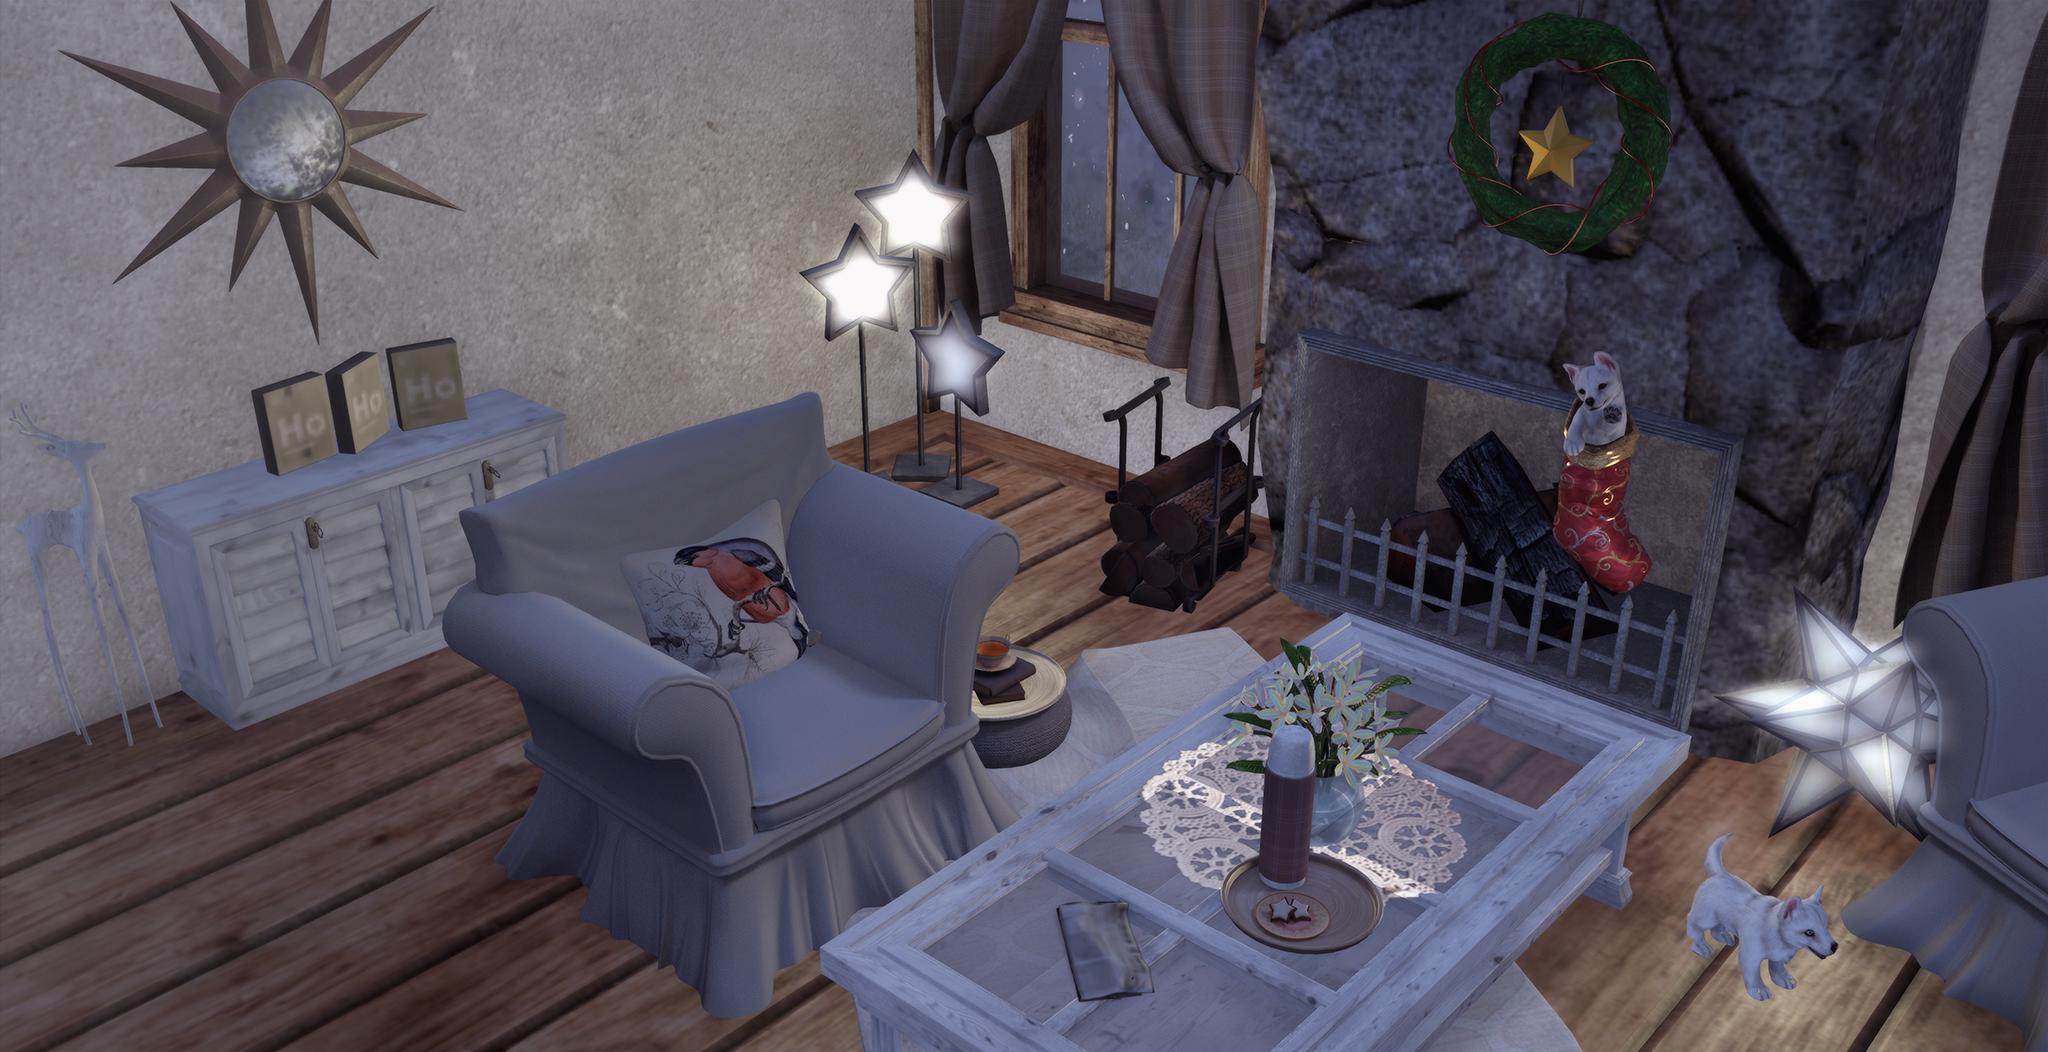 My little cottage